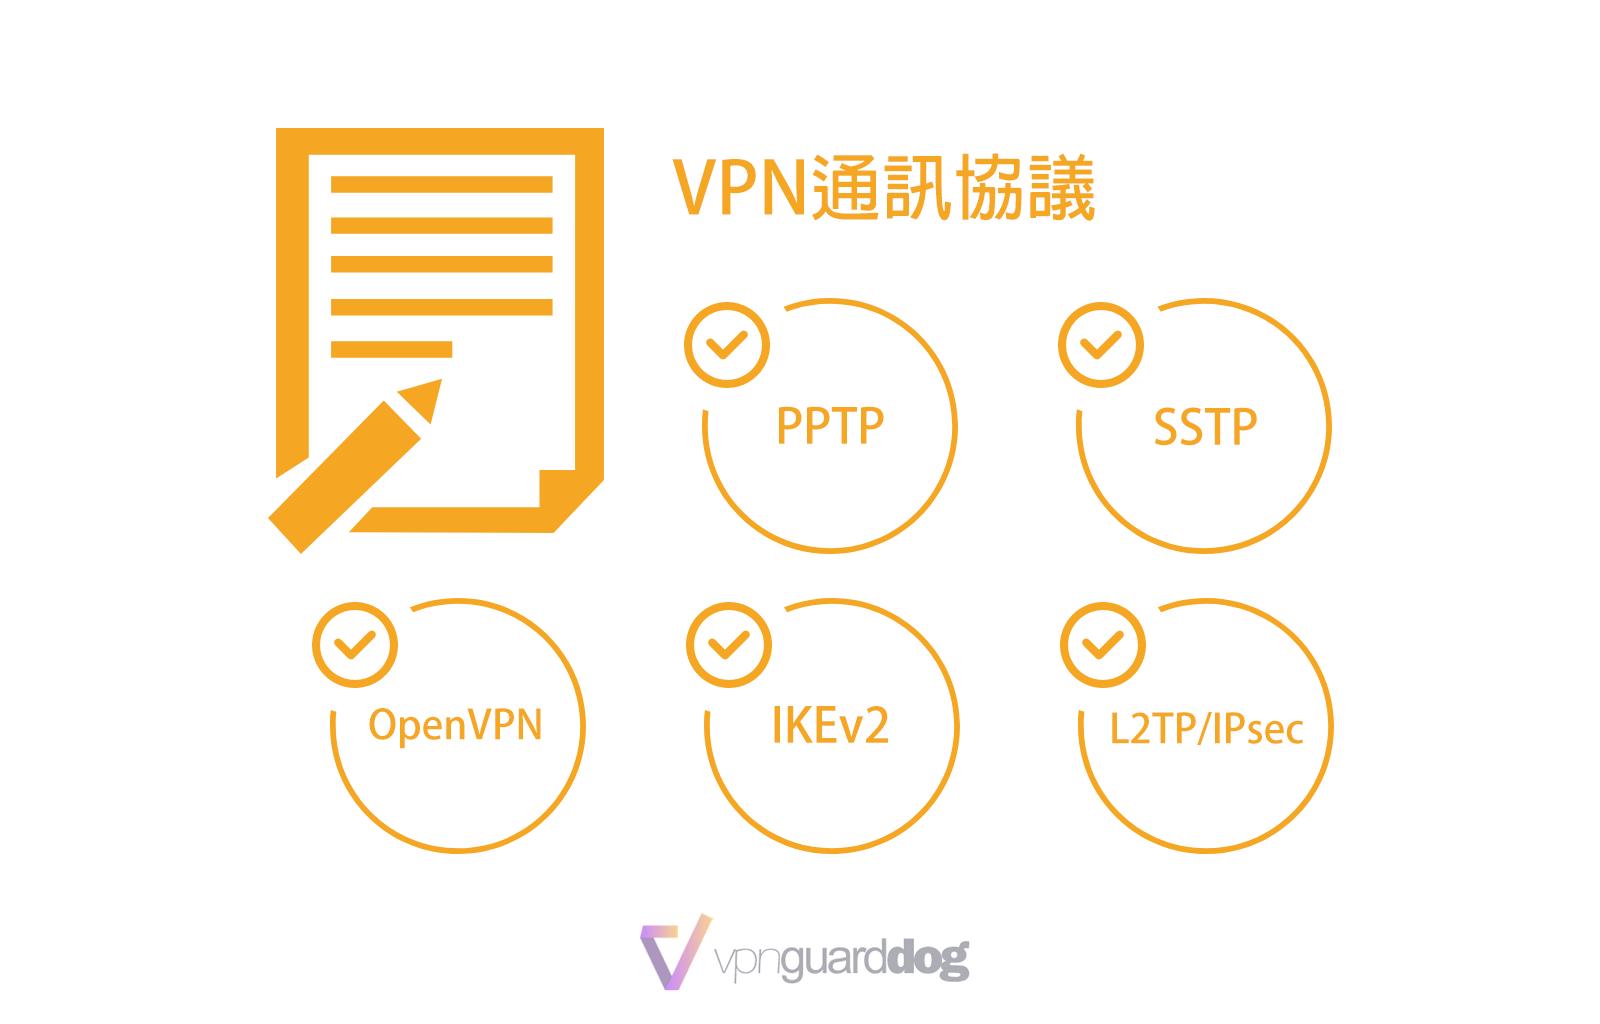 VPN通訊協議